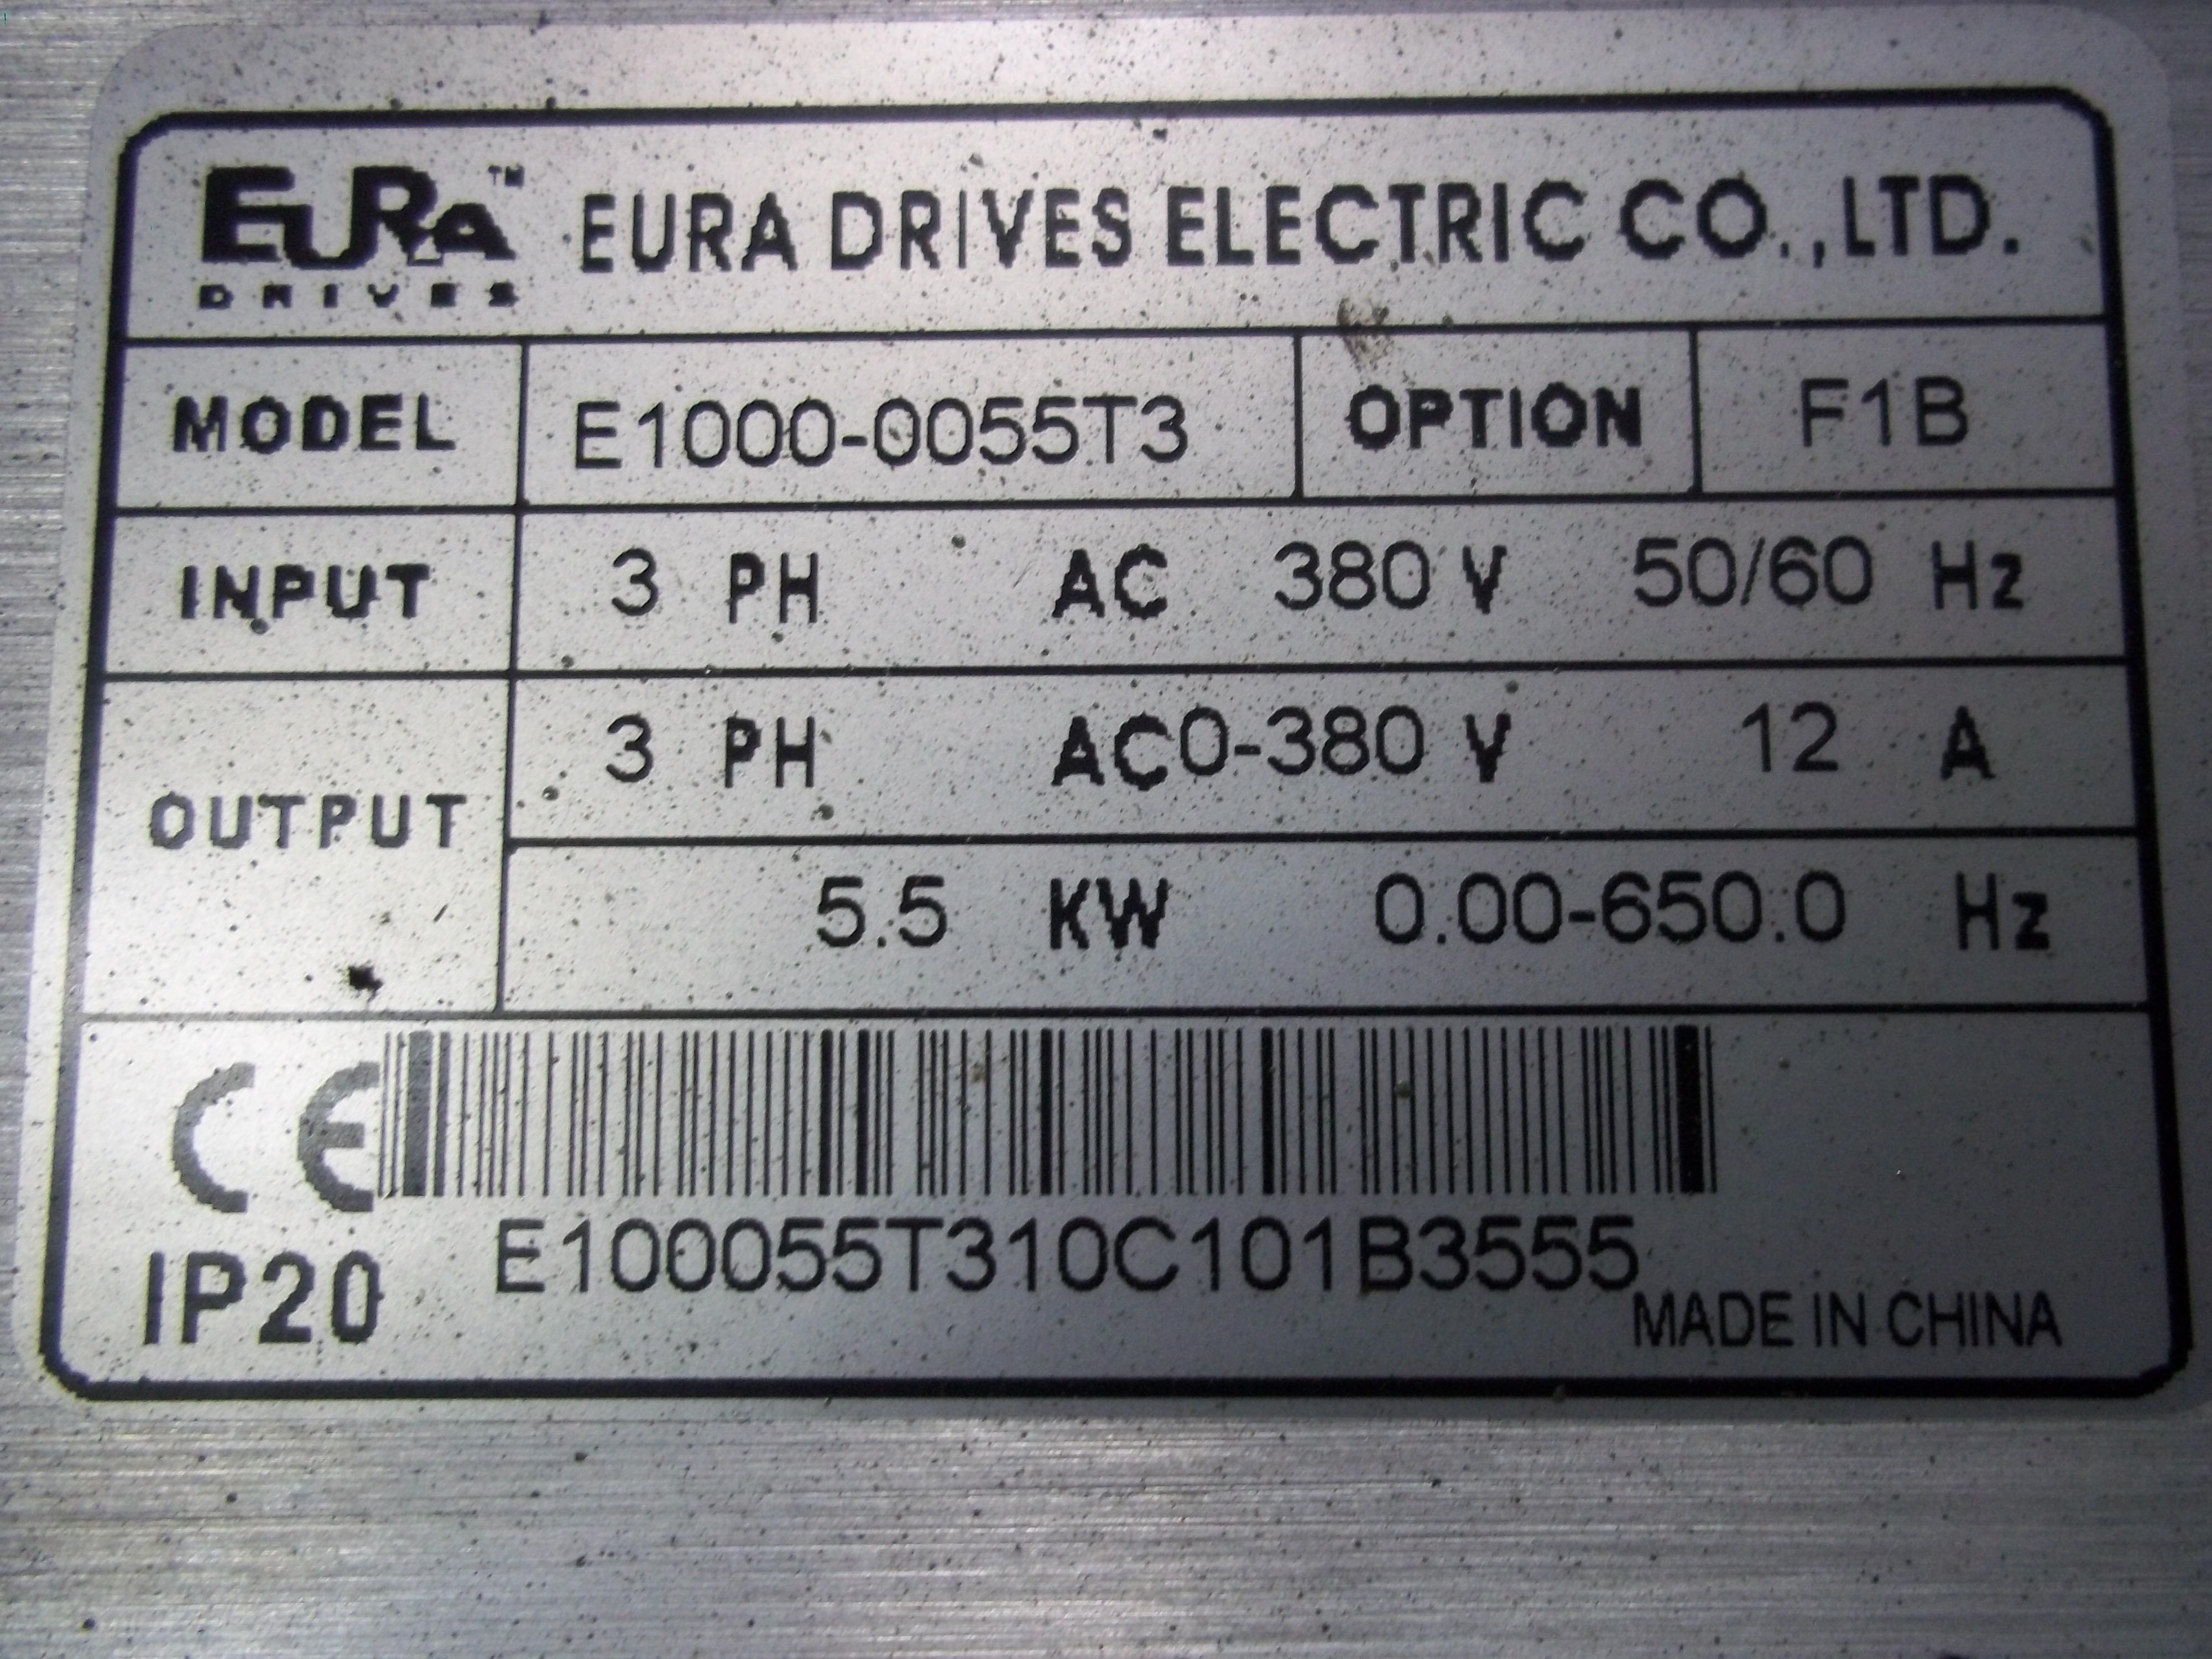 Repair E1000-0055T3 EURA  EURA DRIVE in Malaysia, Singapore, Thailand, Indonesia